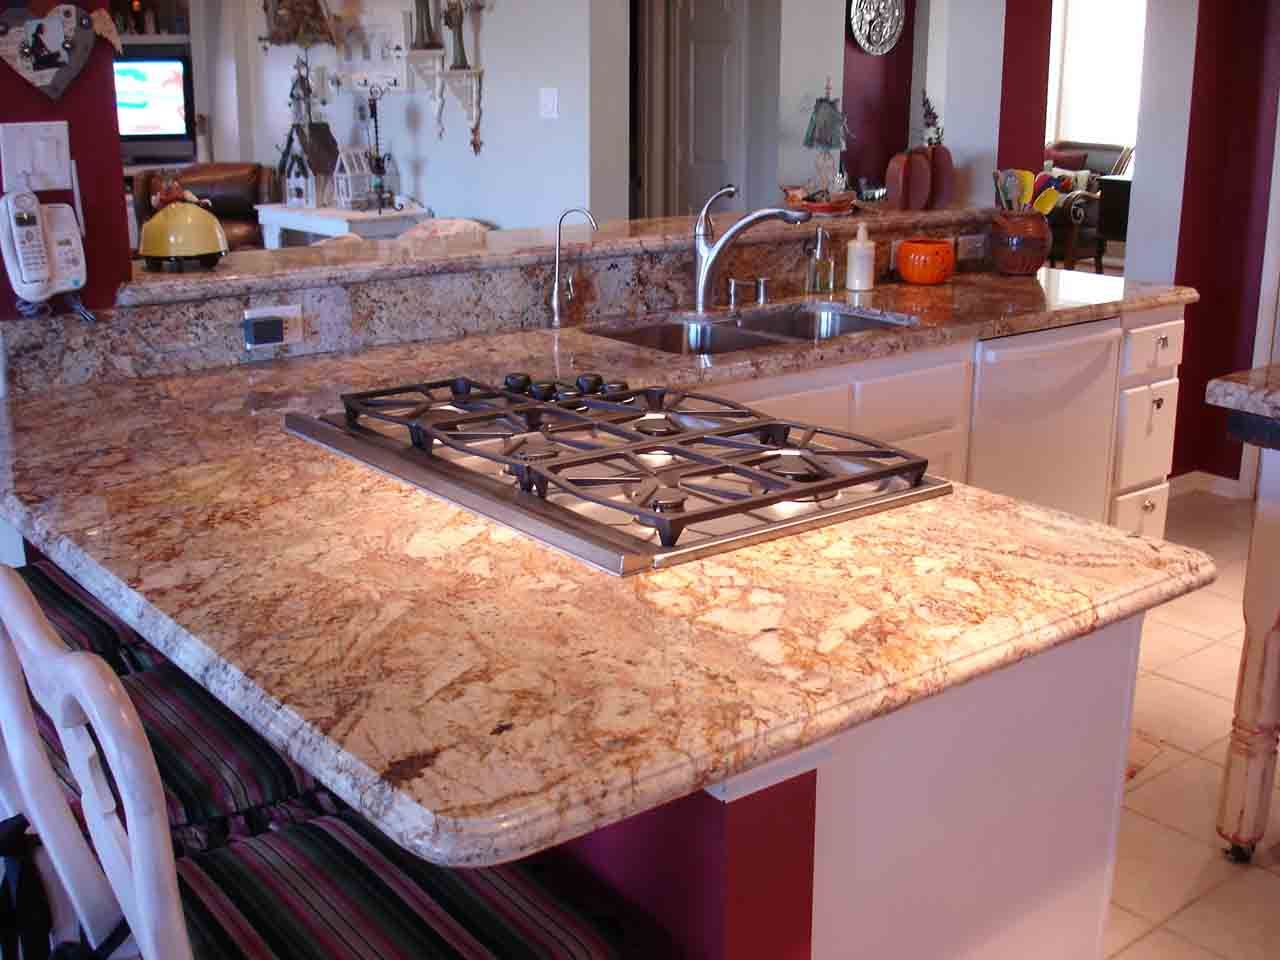 Typhoon Bordeaux Granite   Kitchen Ideas   Granite ... on Typhoon Bordeaux Granite Backsplash Ideas  id=84293